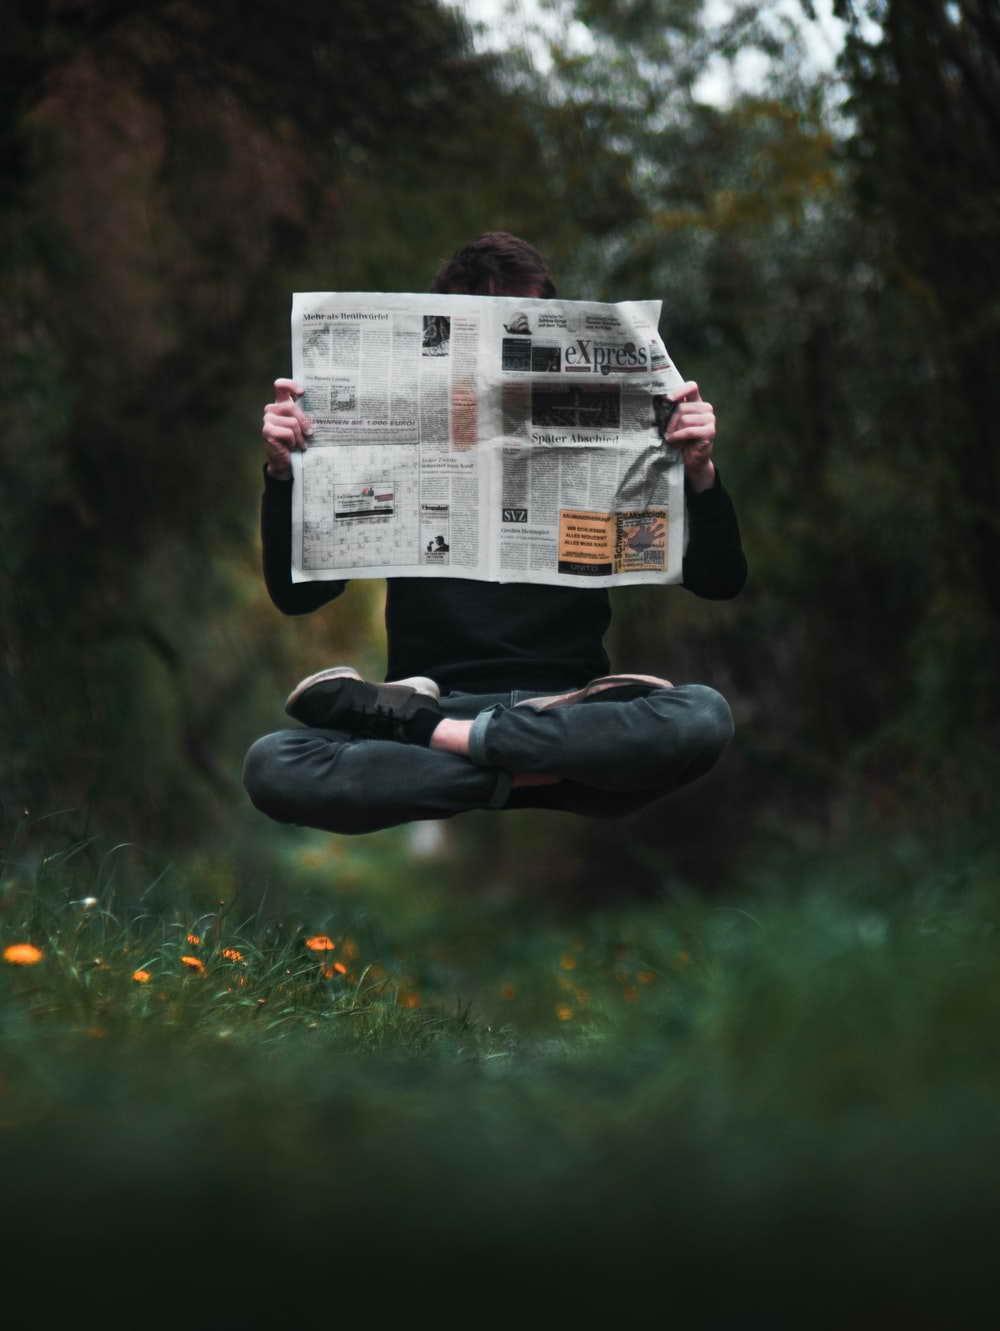 Антуан Гризманн: Мбаппе достигнет уровня Месси или Роналду